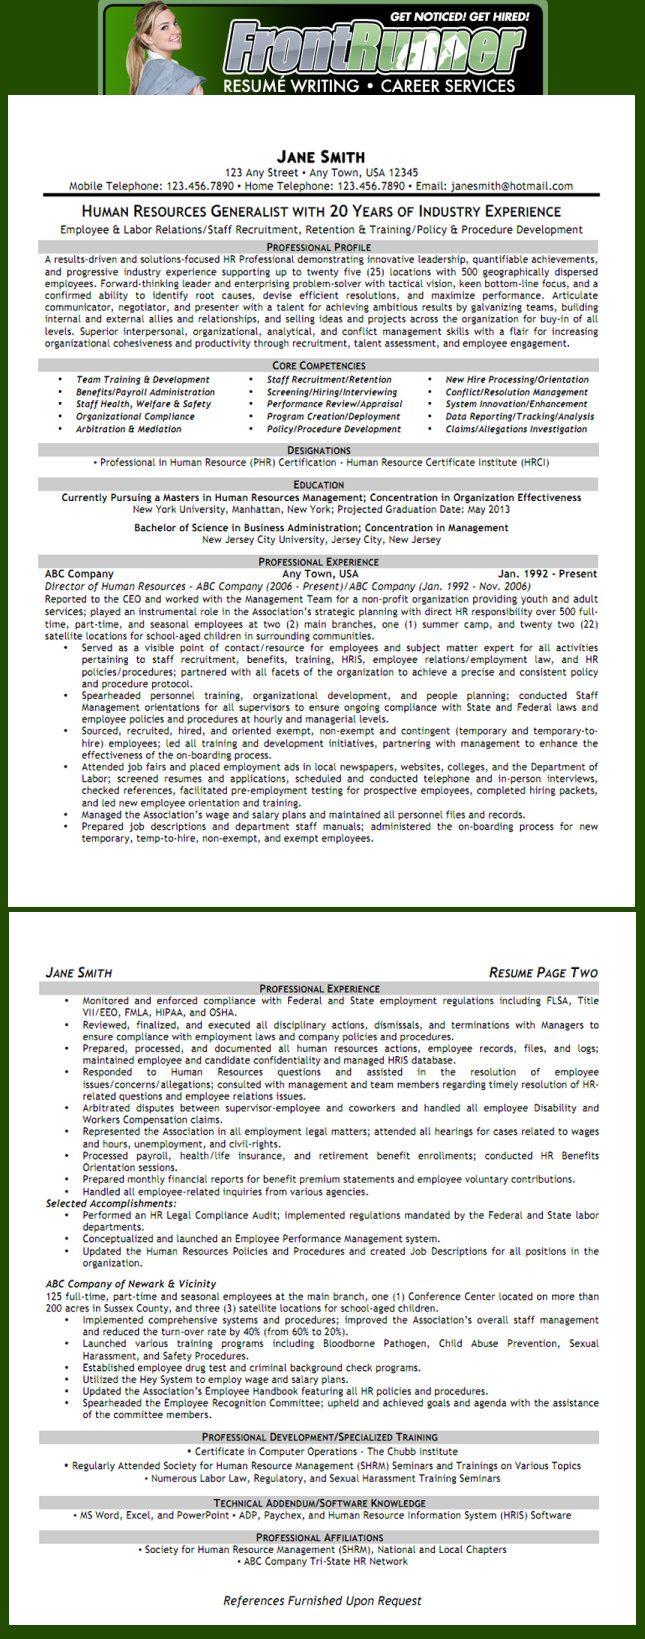 Resume - Human Resources Generalist | Work | Pinterest | Recursos ...